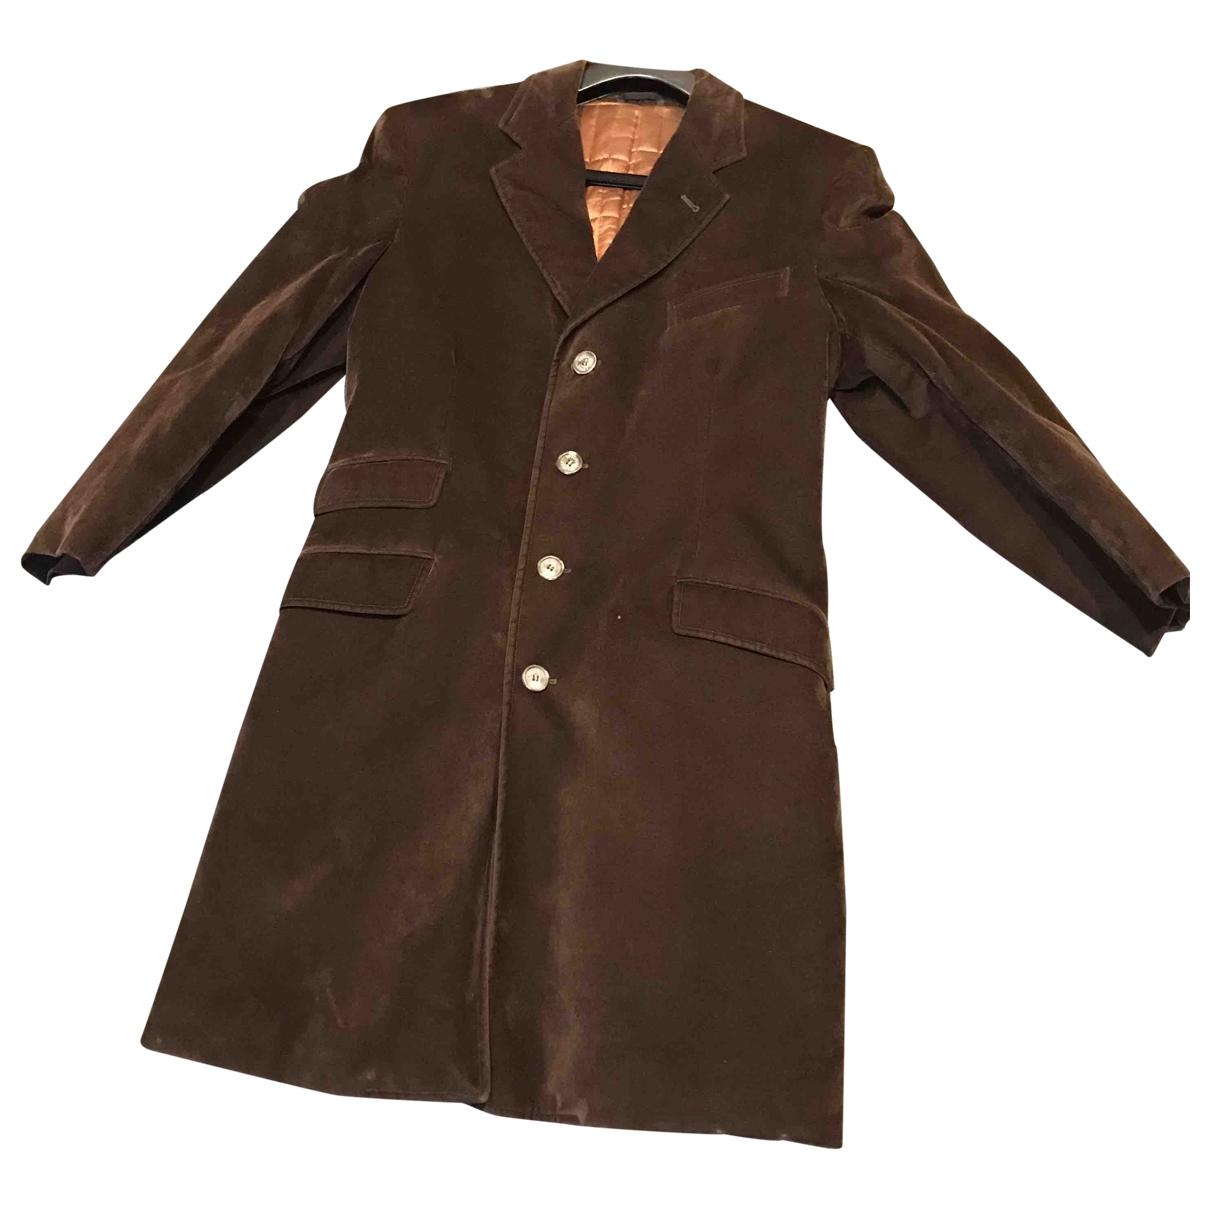 Moschino Cheap And Chic - Manteau   pour homme en velours - marron